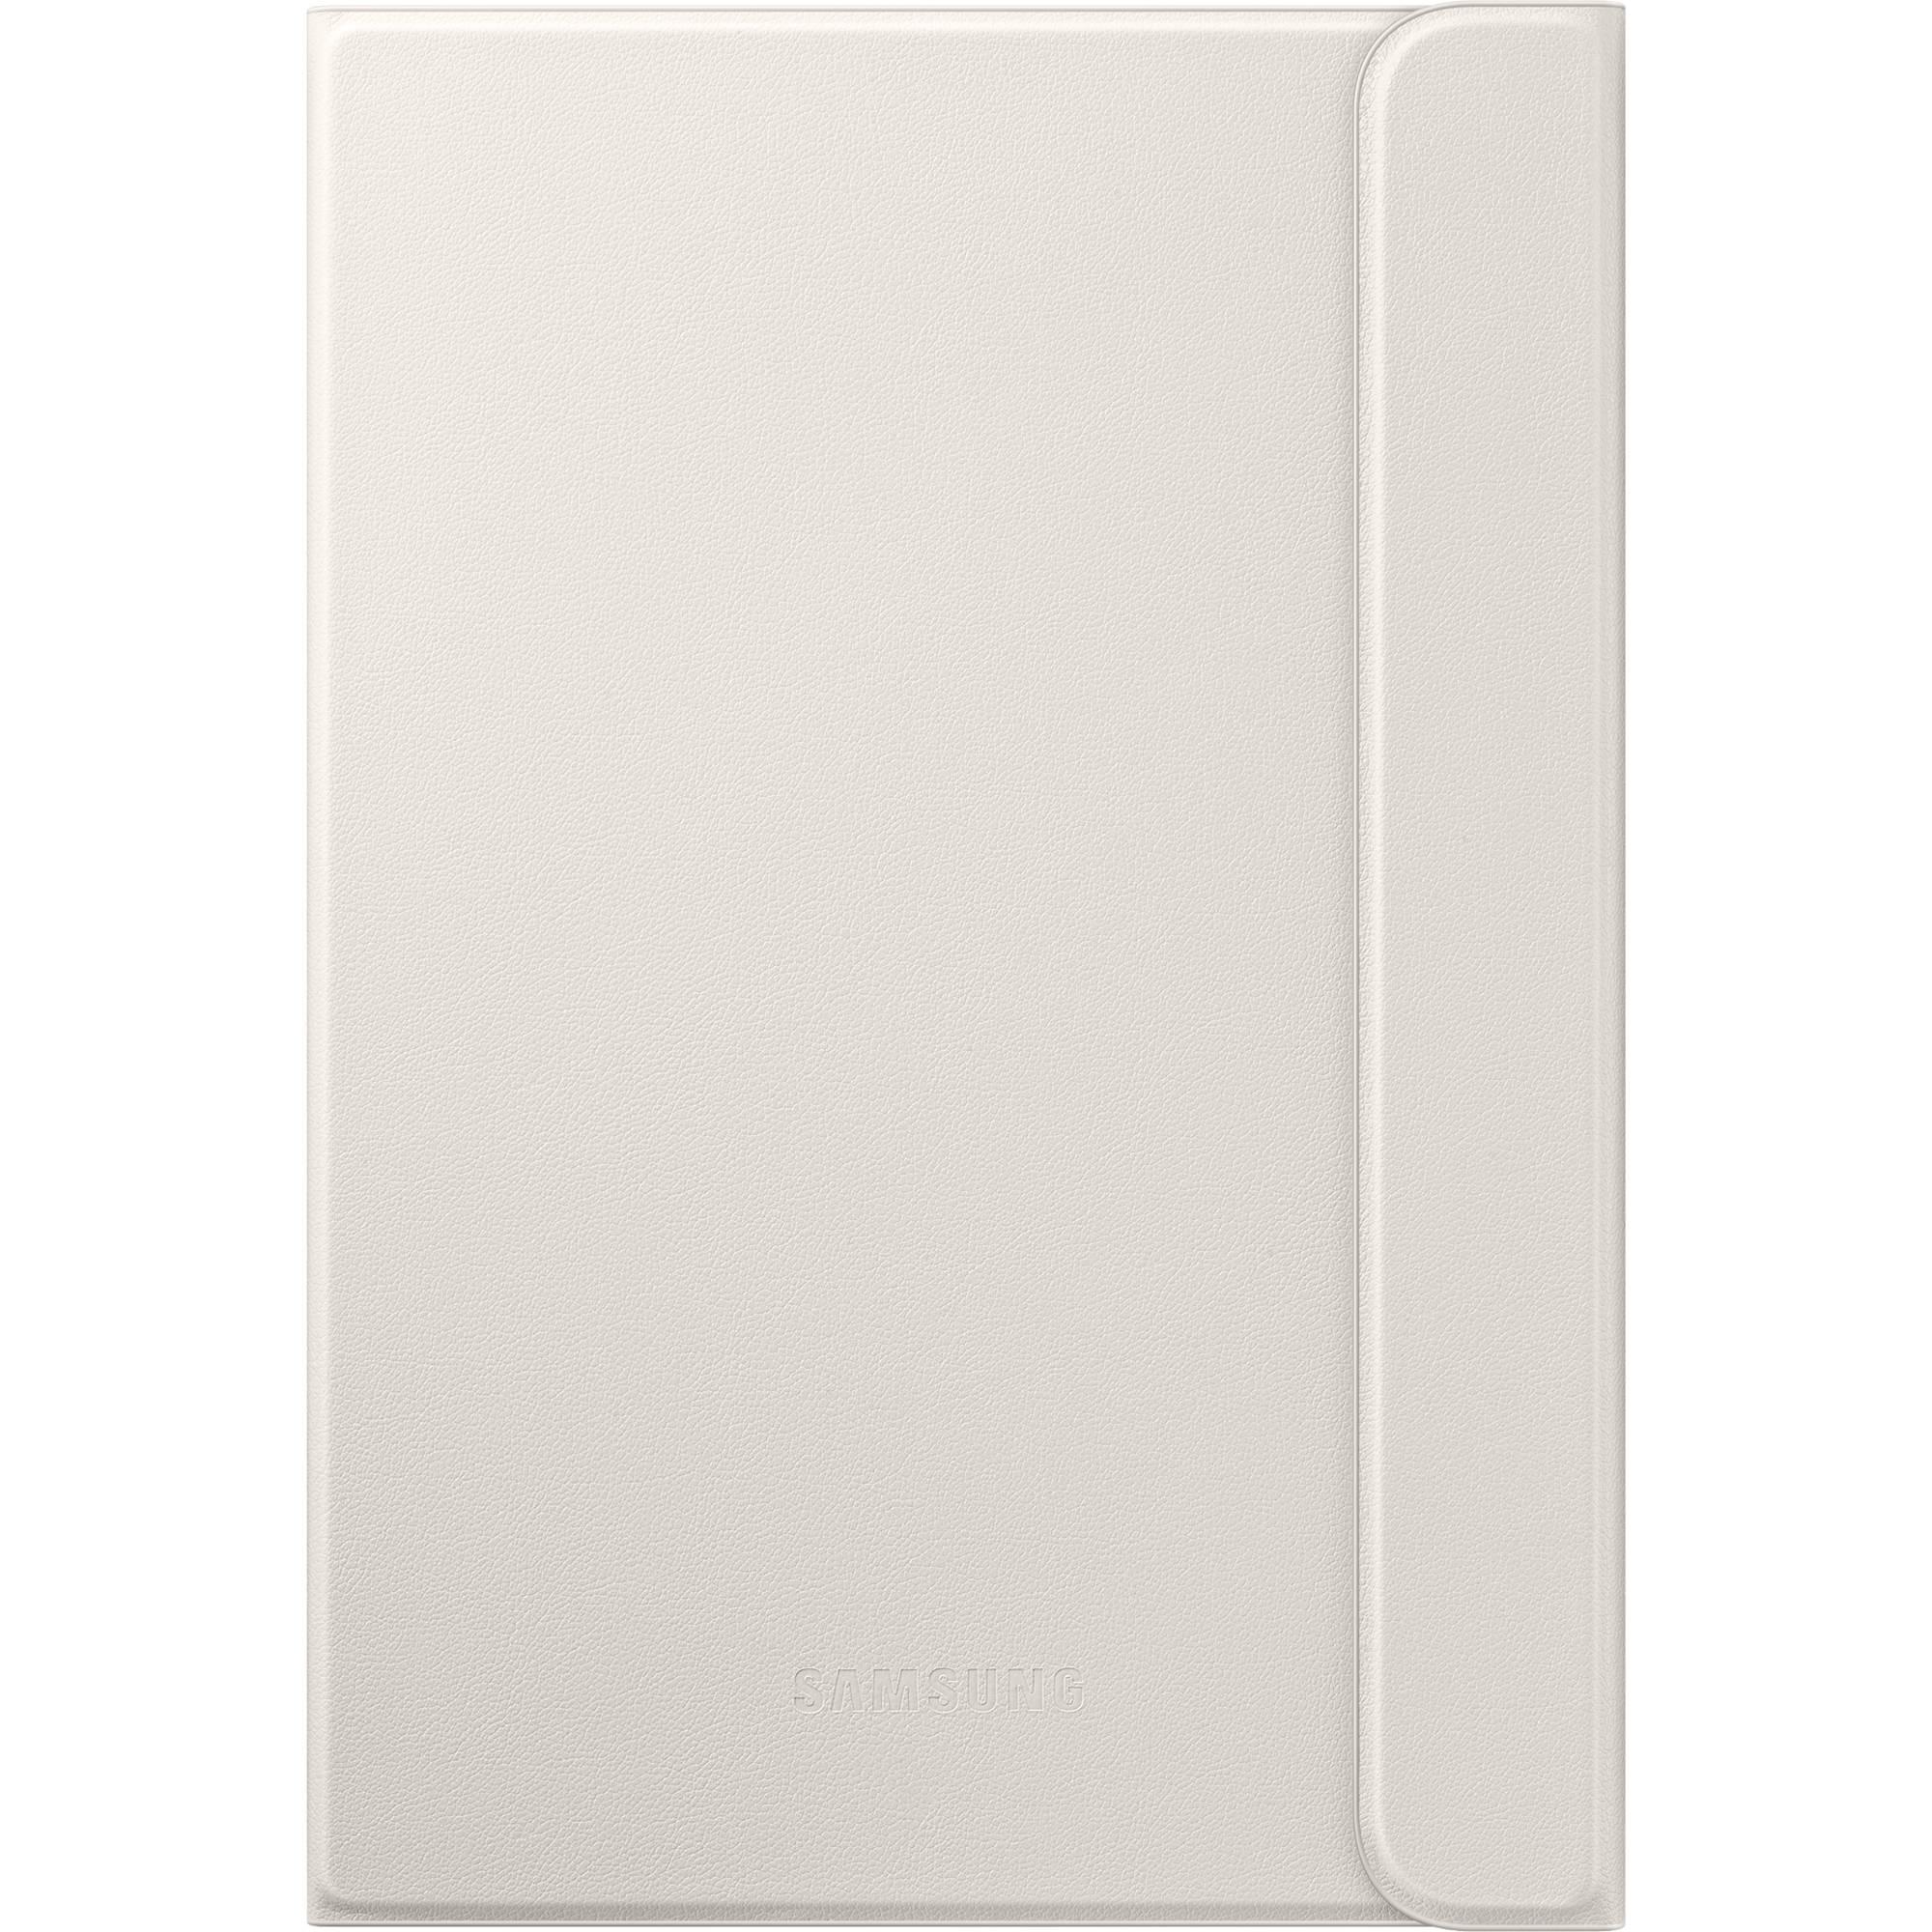 Samsung Tab S Book Cover White : Samsung galaxy tab s book cover white ef